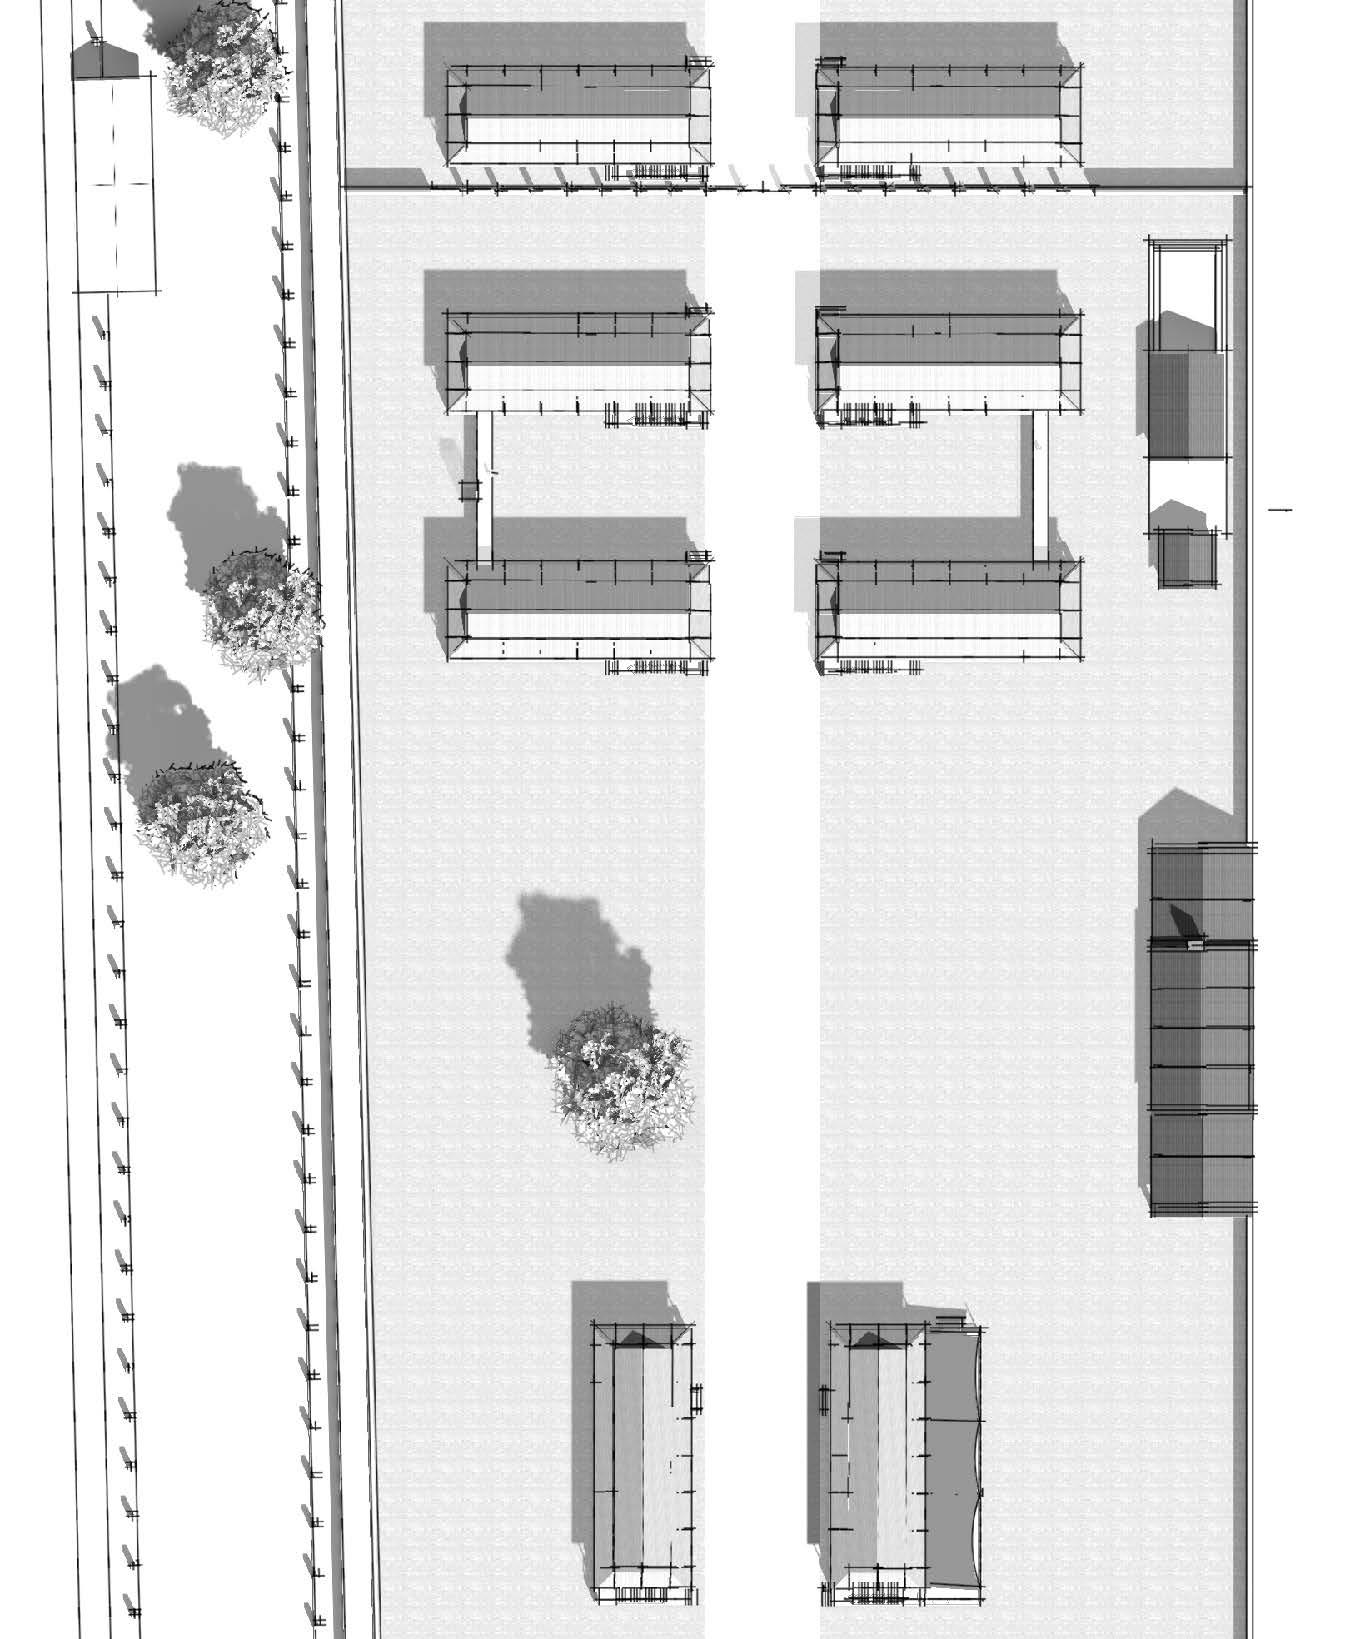 scanario 2 plan.jpg